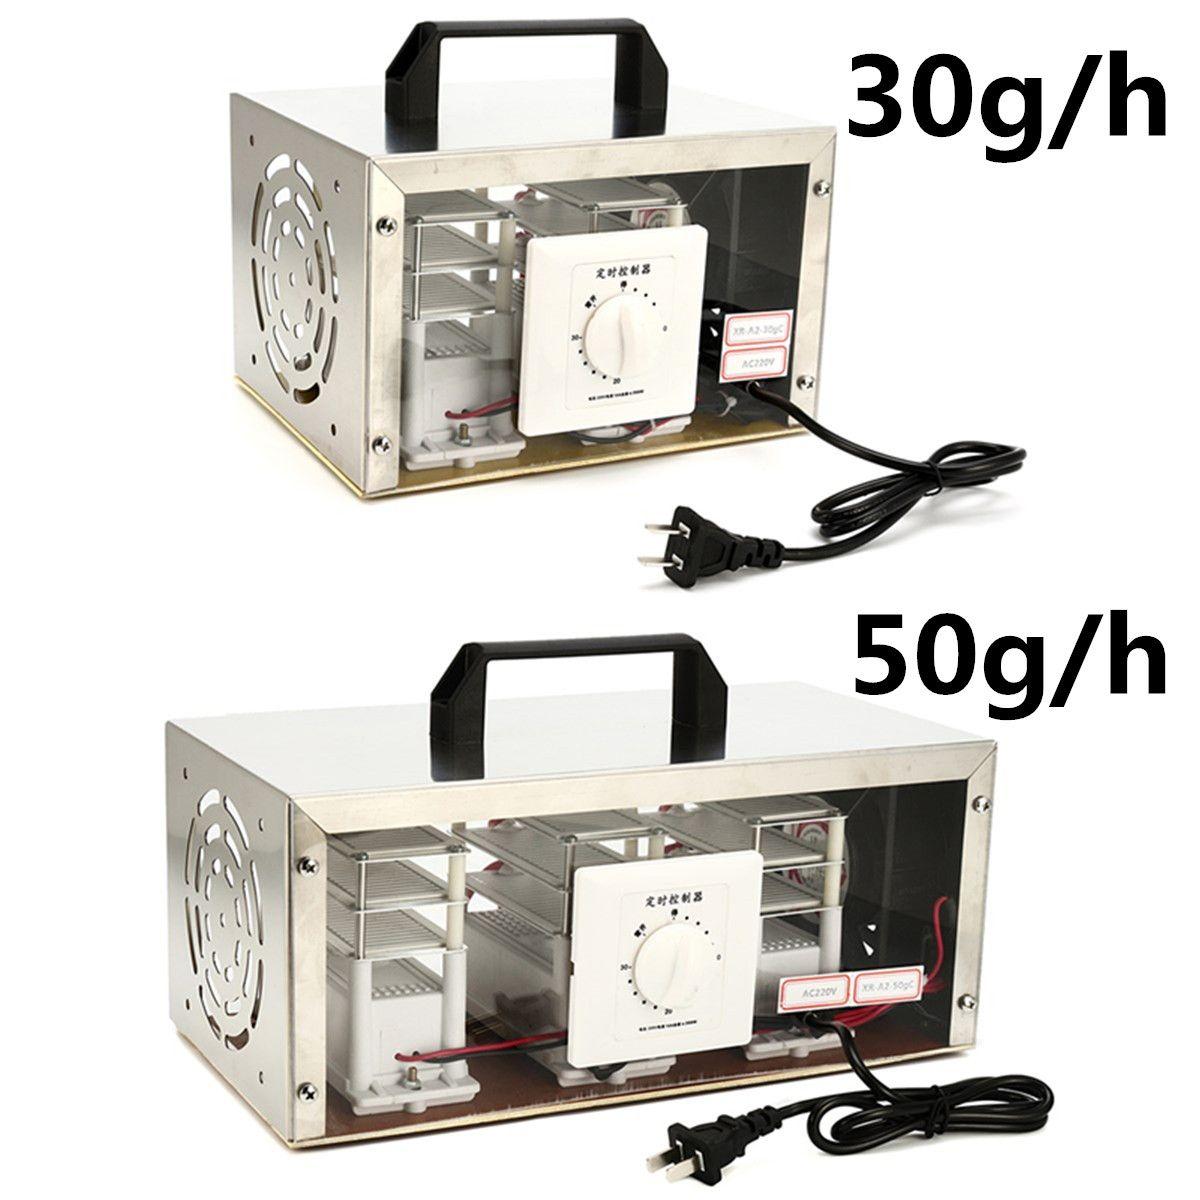 30 gr/std 50 gr/std 220 V Luft Ozon Generator Luft Purifier Sterilisator Ozonator Tragbare Ozonisator Reiniger Sterilisator mit Timing Schalter